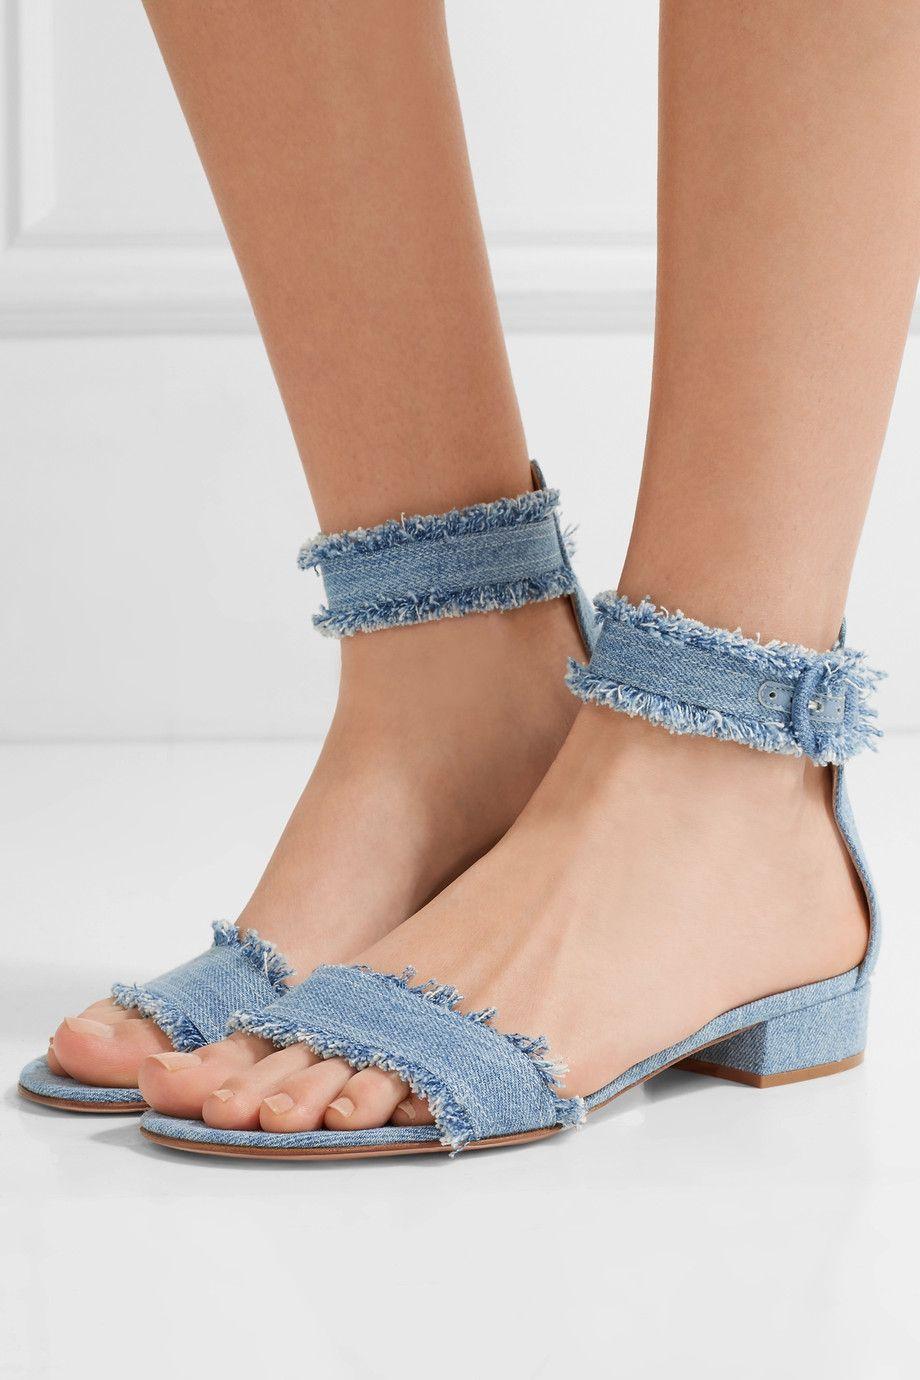 Gianvito Rossi Portofino Frayed Denim Sandals Net A Porter Com Fashion Shoes Comfortable Block Heels Denim Sandals